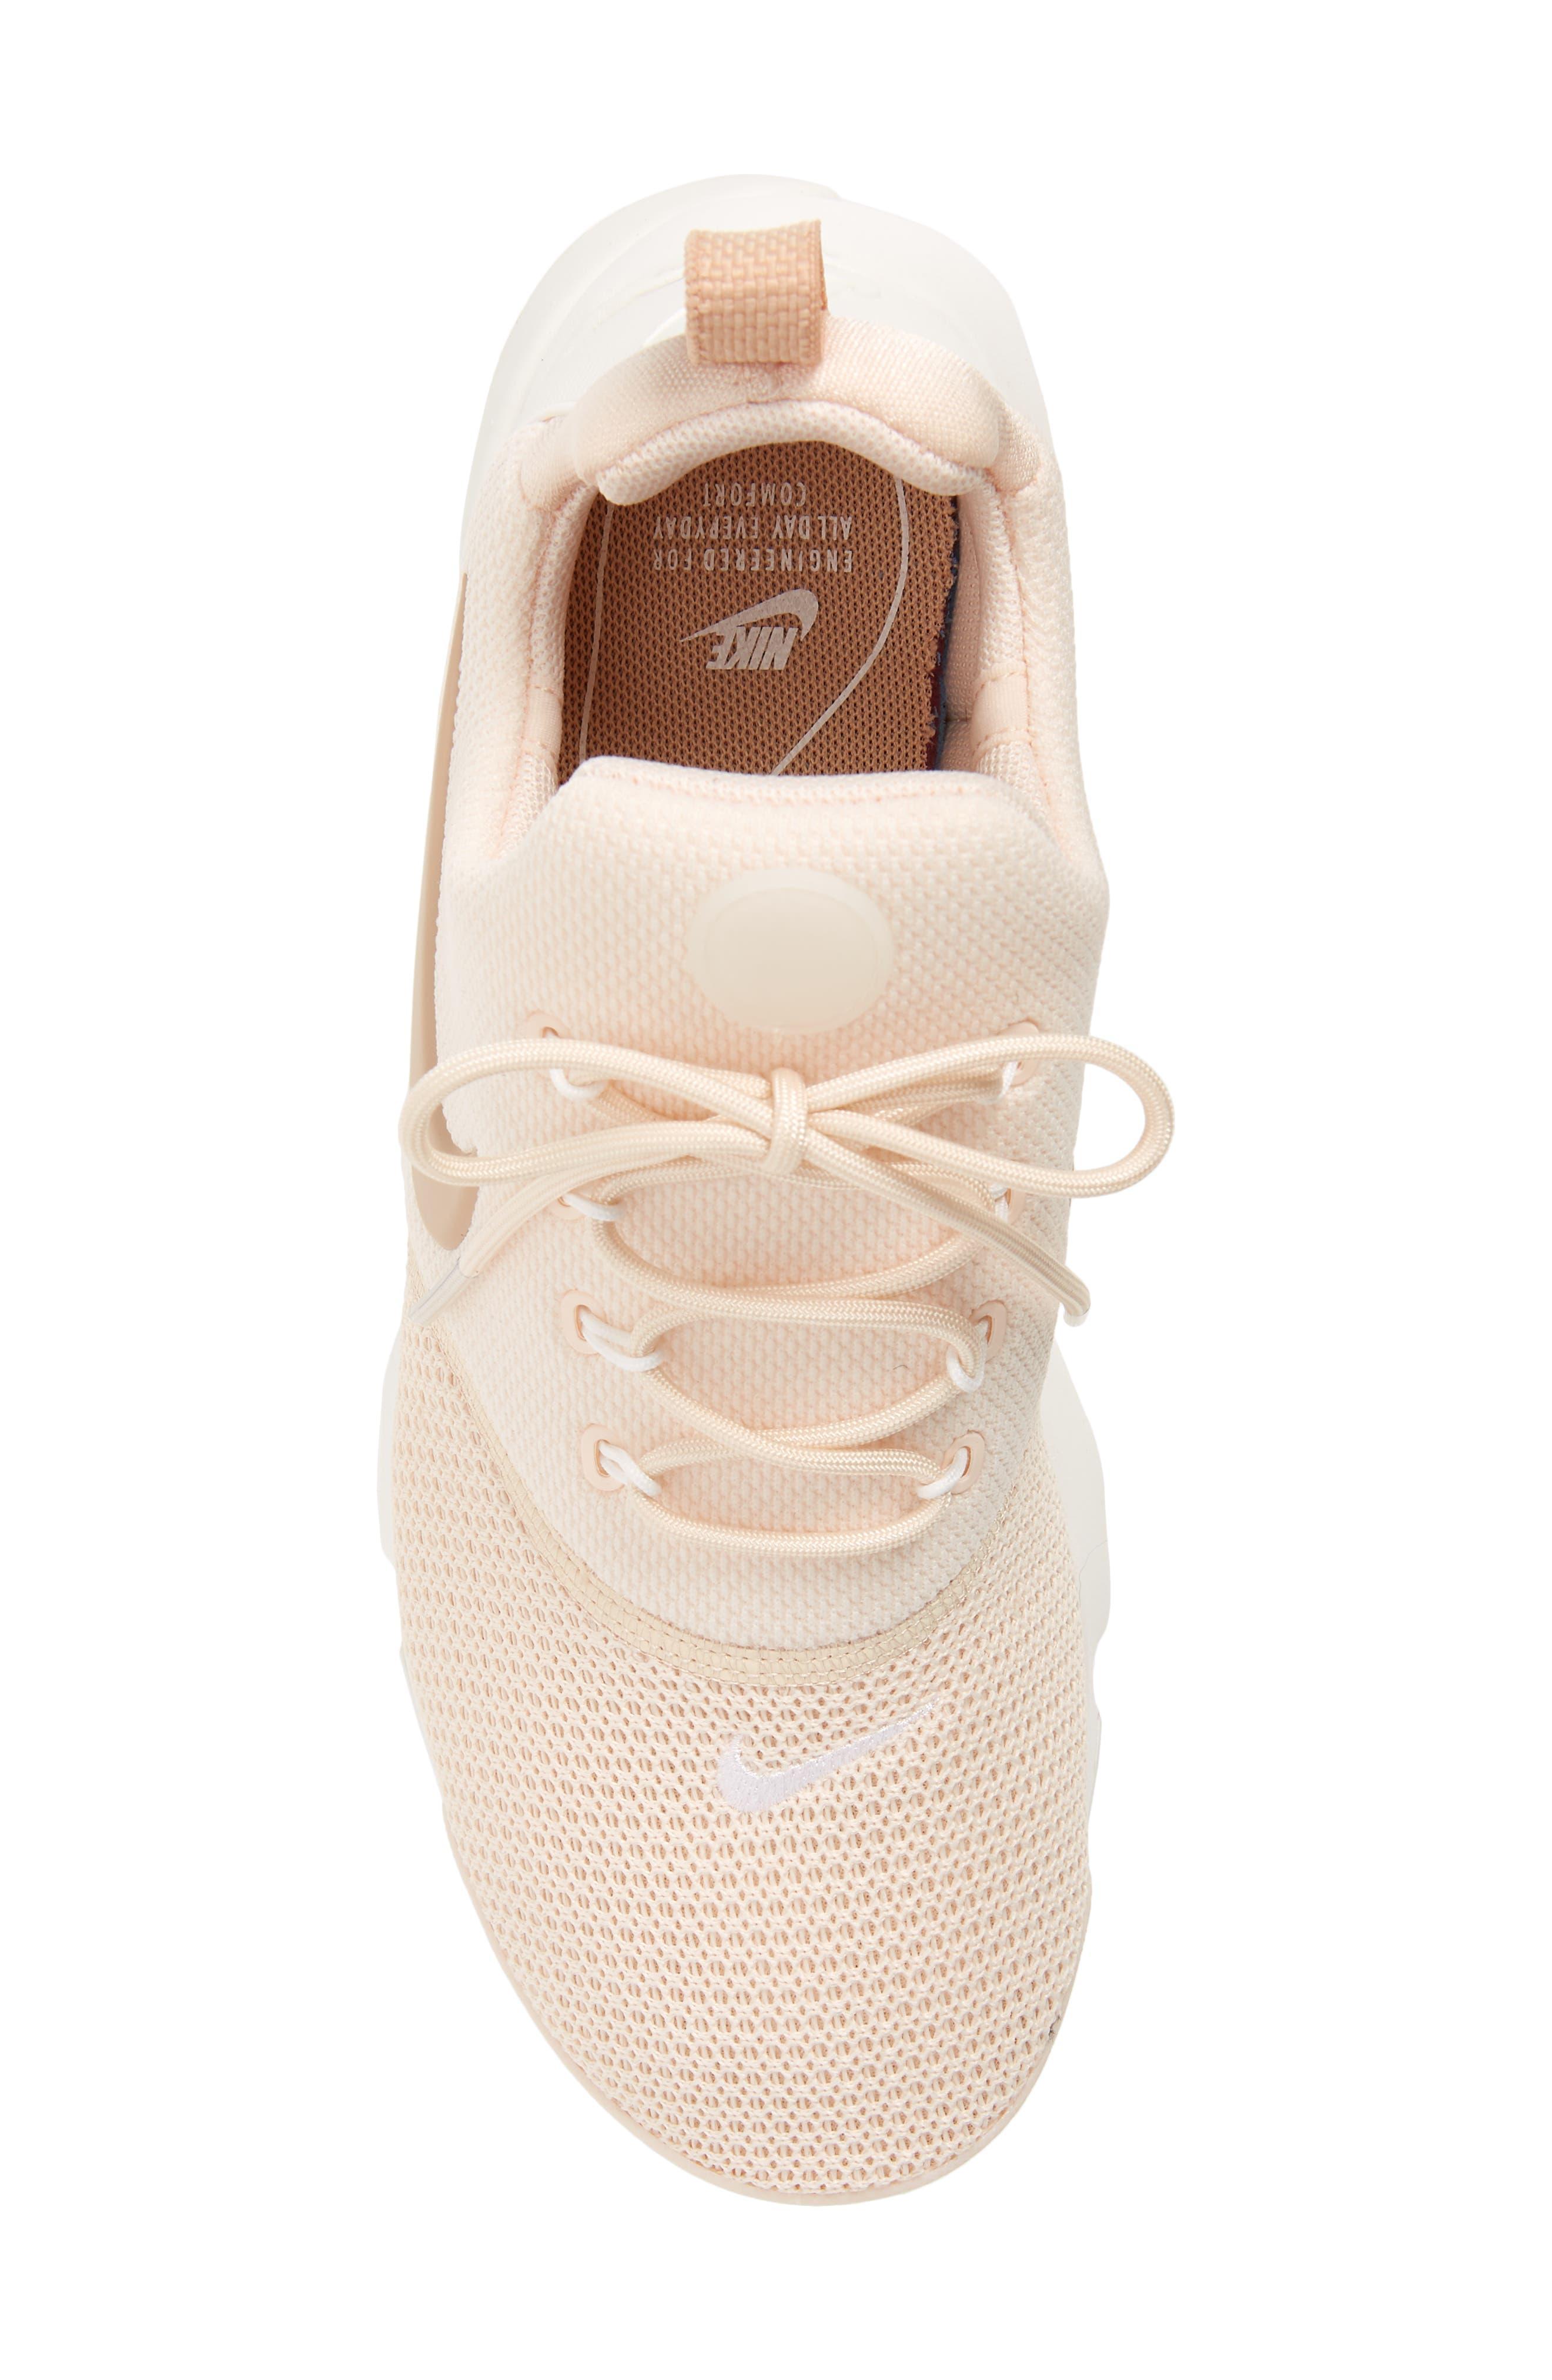 Presto Fly Sneaker,                             Alternate thumbnail 4, color,                             Guava Ice/ Beige/ Summit White